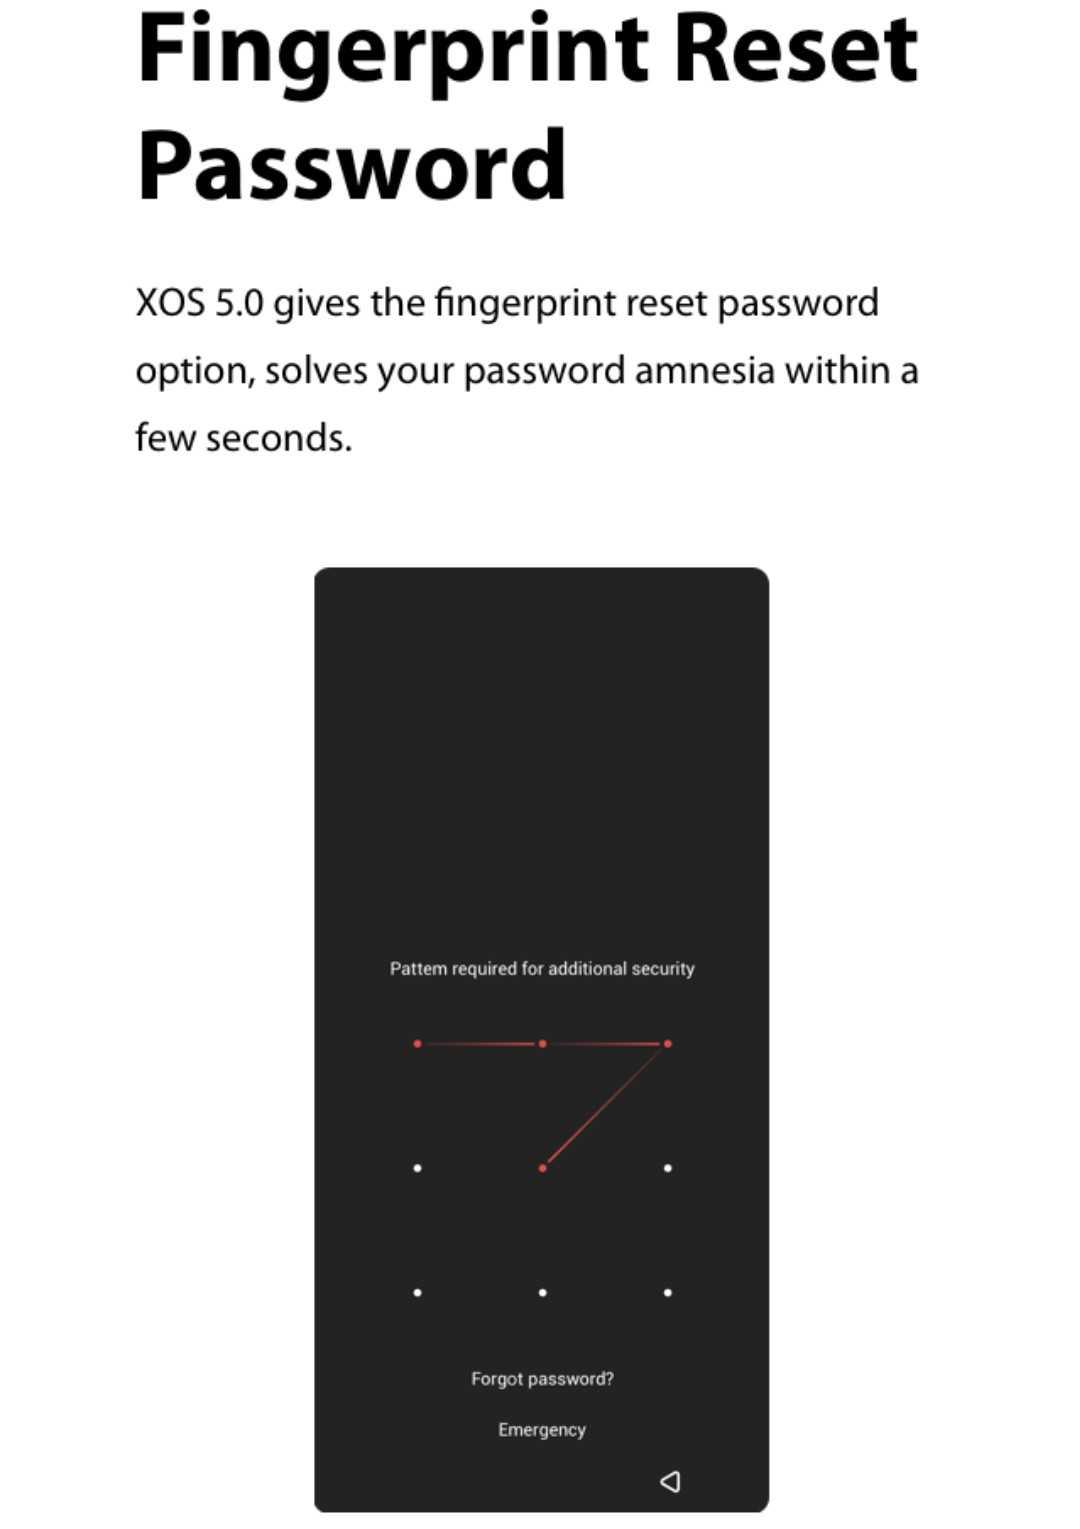 XOS 5.0 Cheetah fingerprint reset password